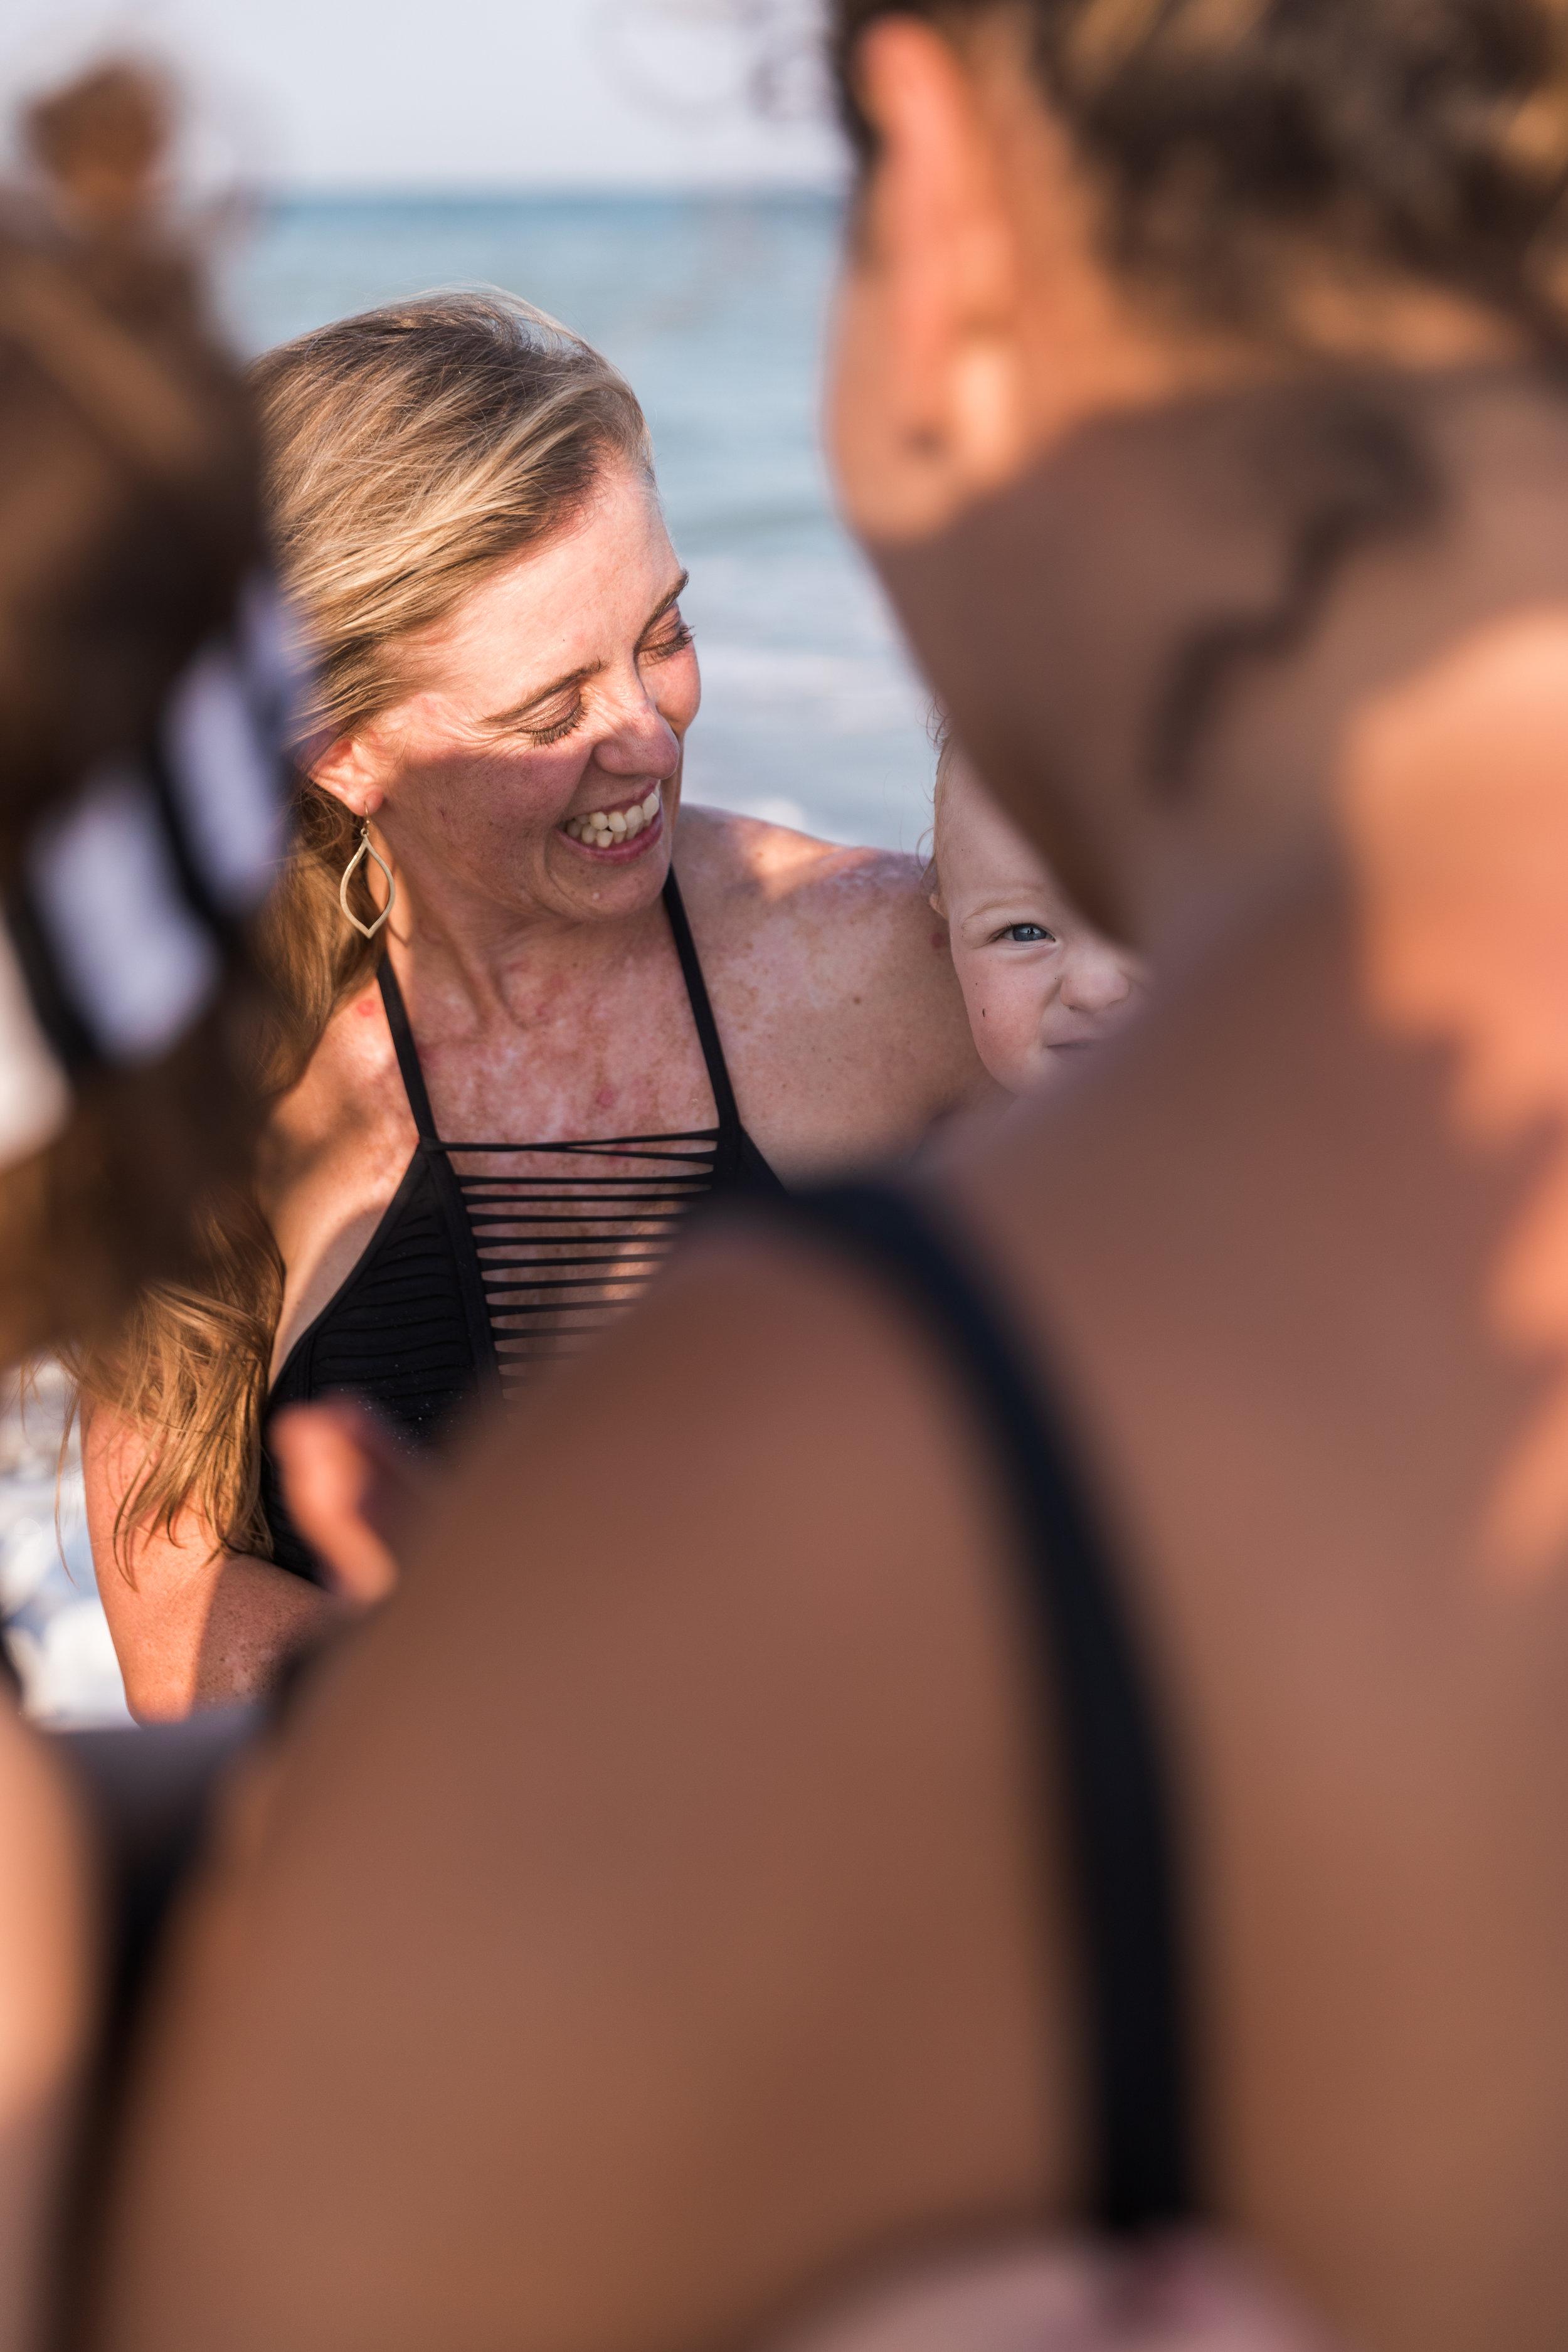 Embrace Your Mommy Bod - Myrtle Beach29.jpg